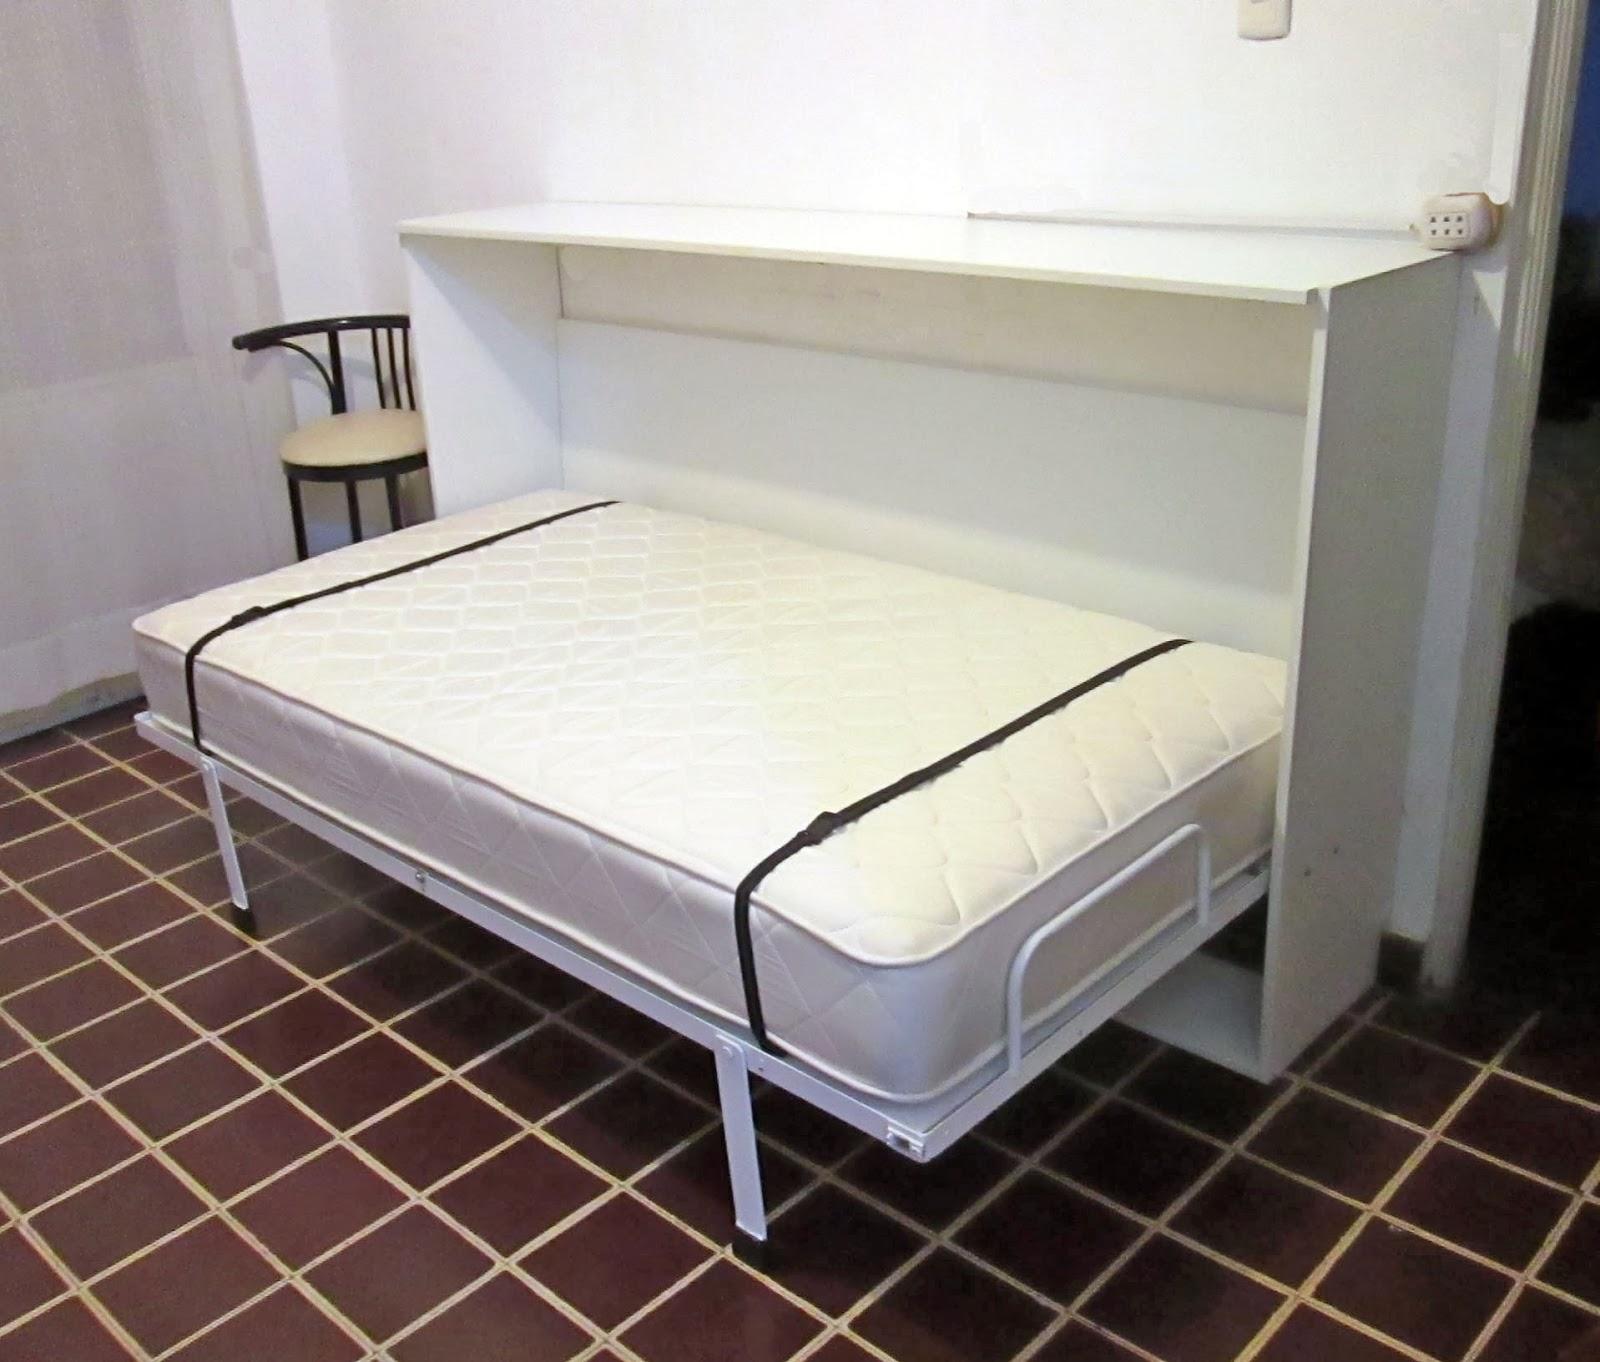 Camas Abatibles BUNKER BED: Cama Bunker Bed de 1,5 pl y 2 pl